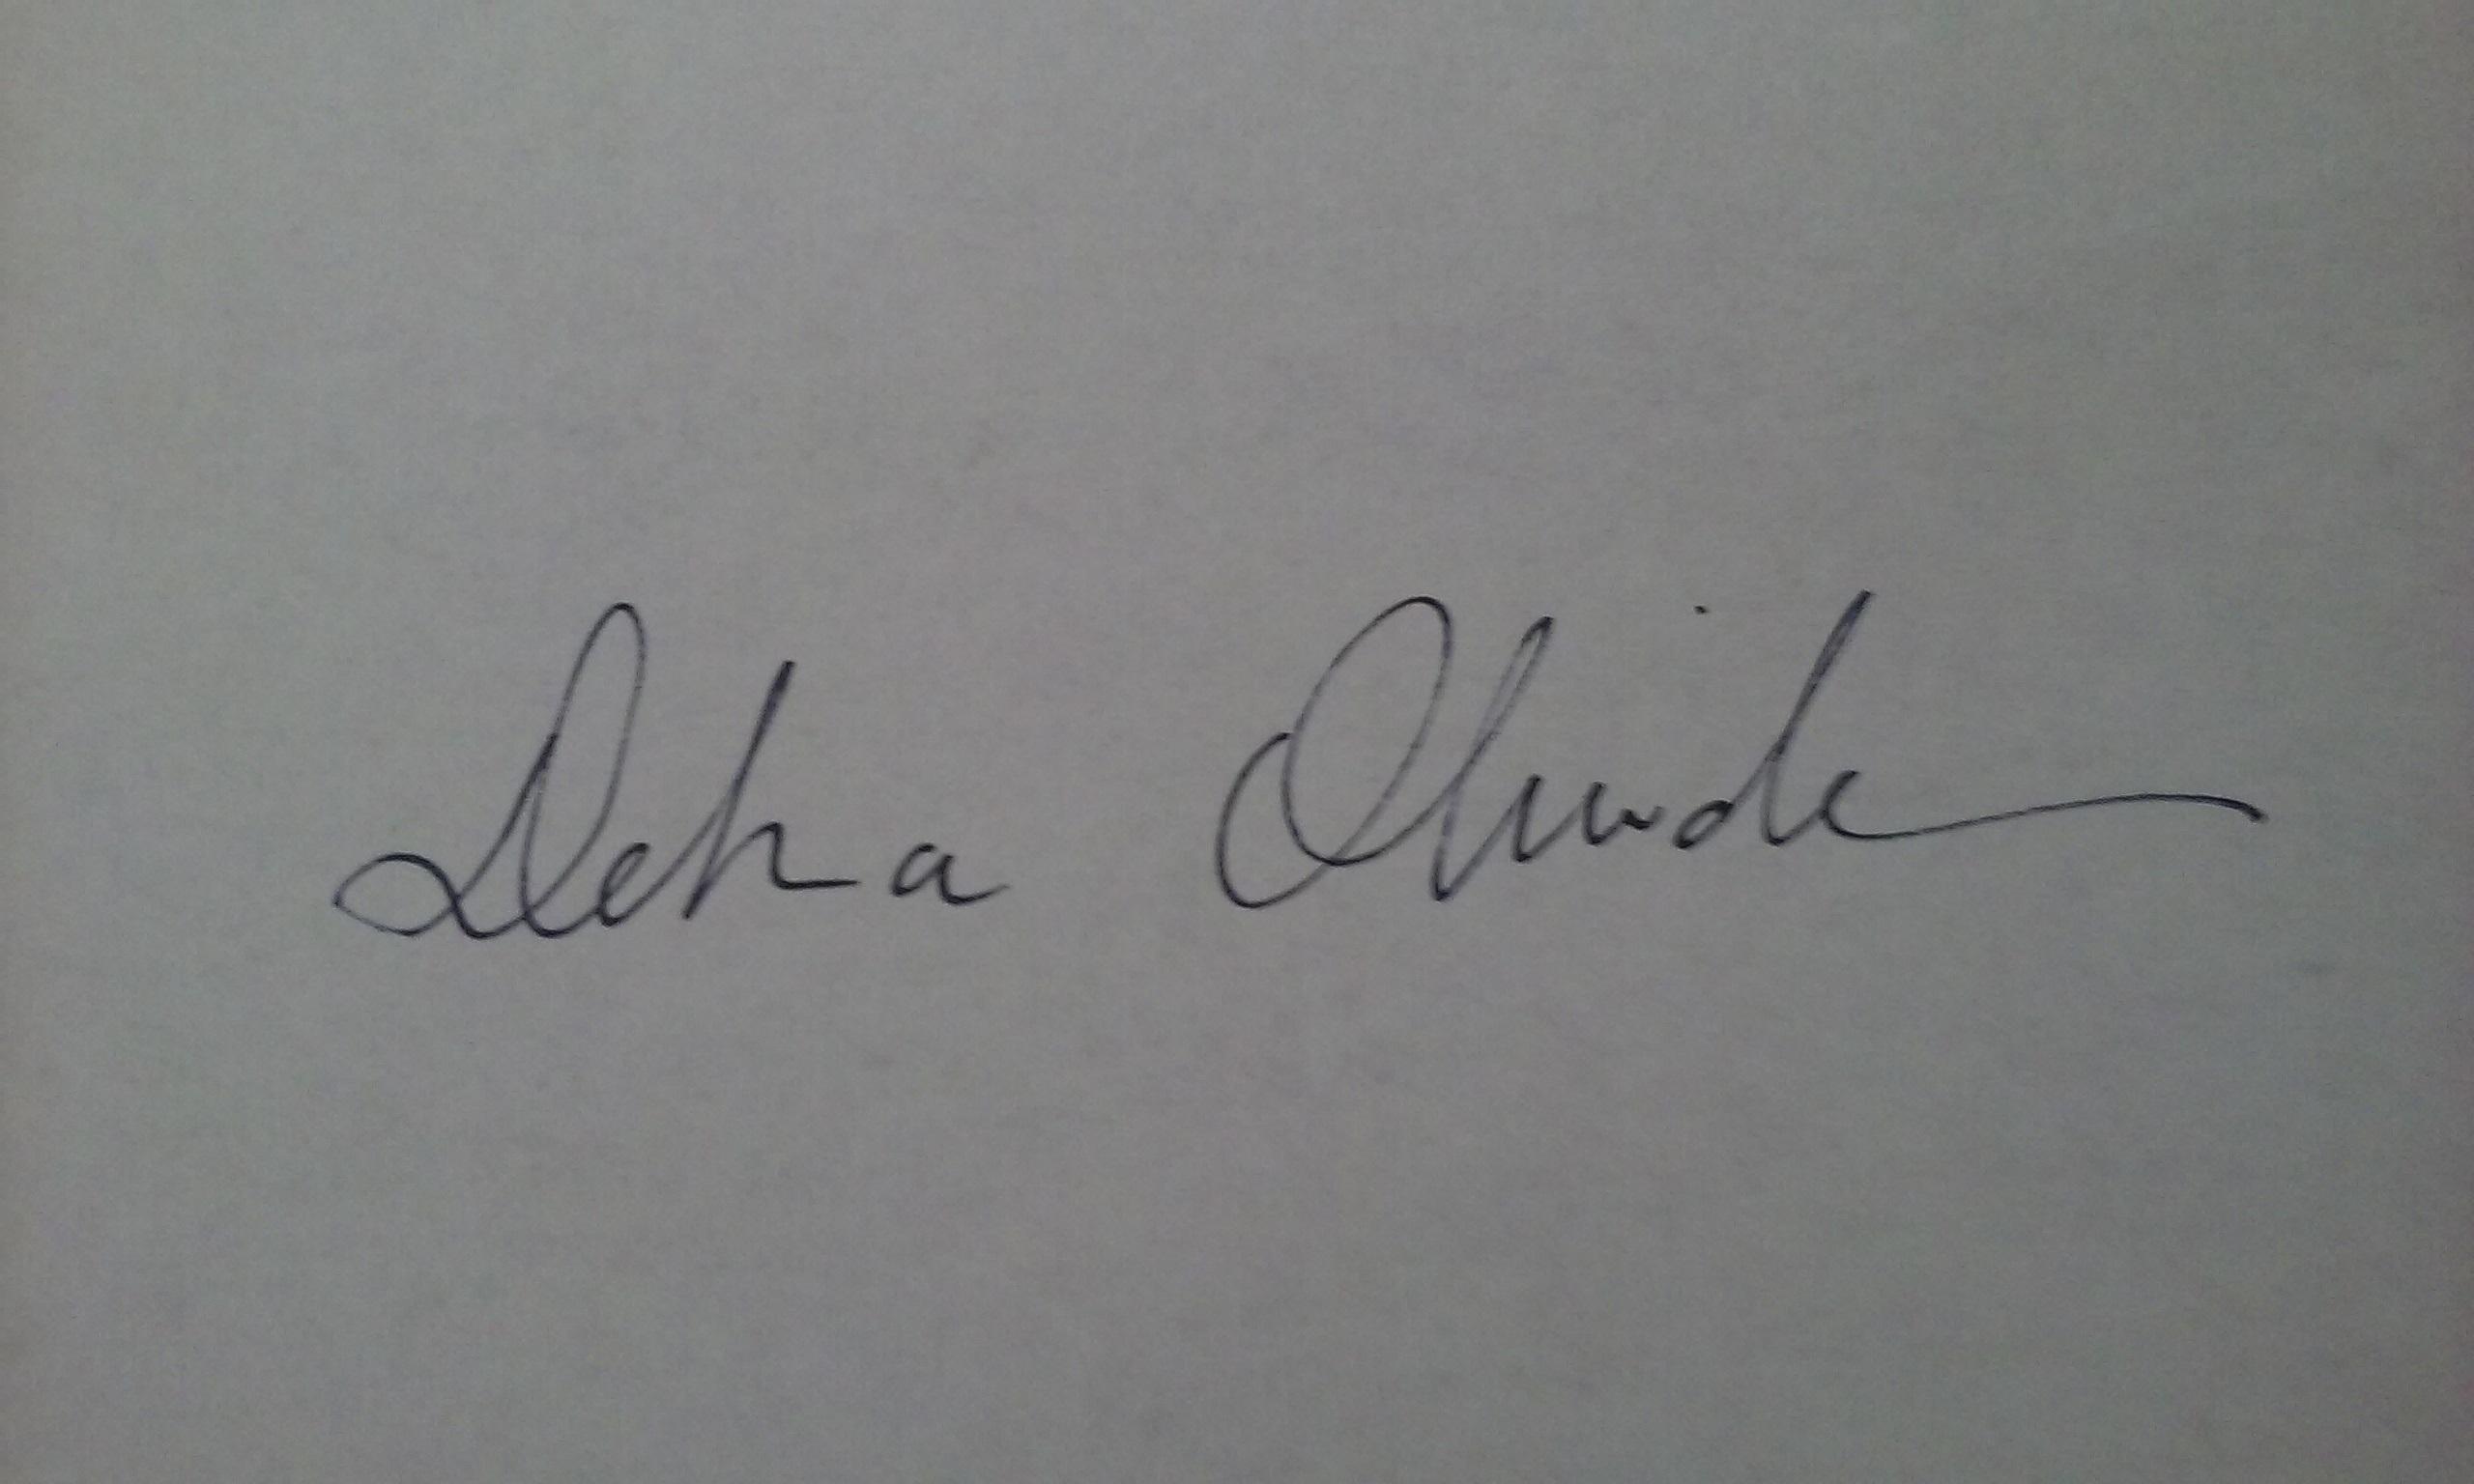 Debra Olivadese's Signature